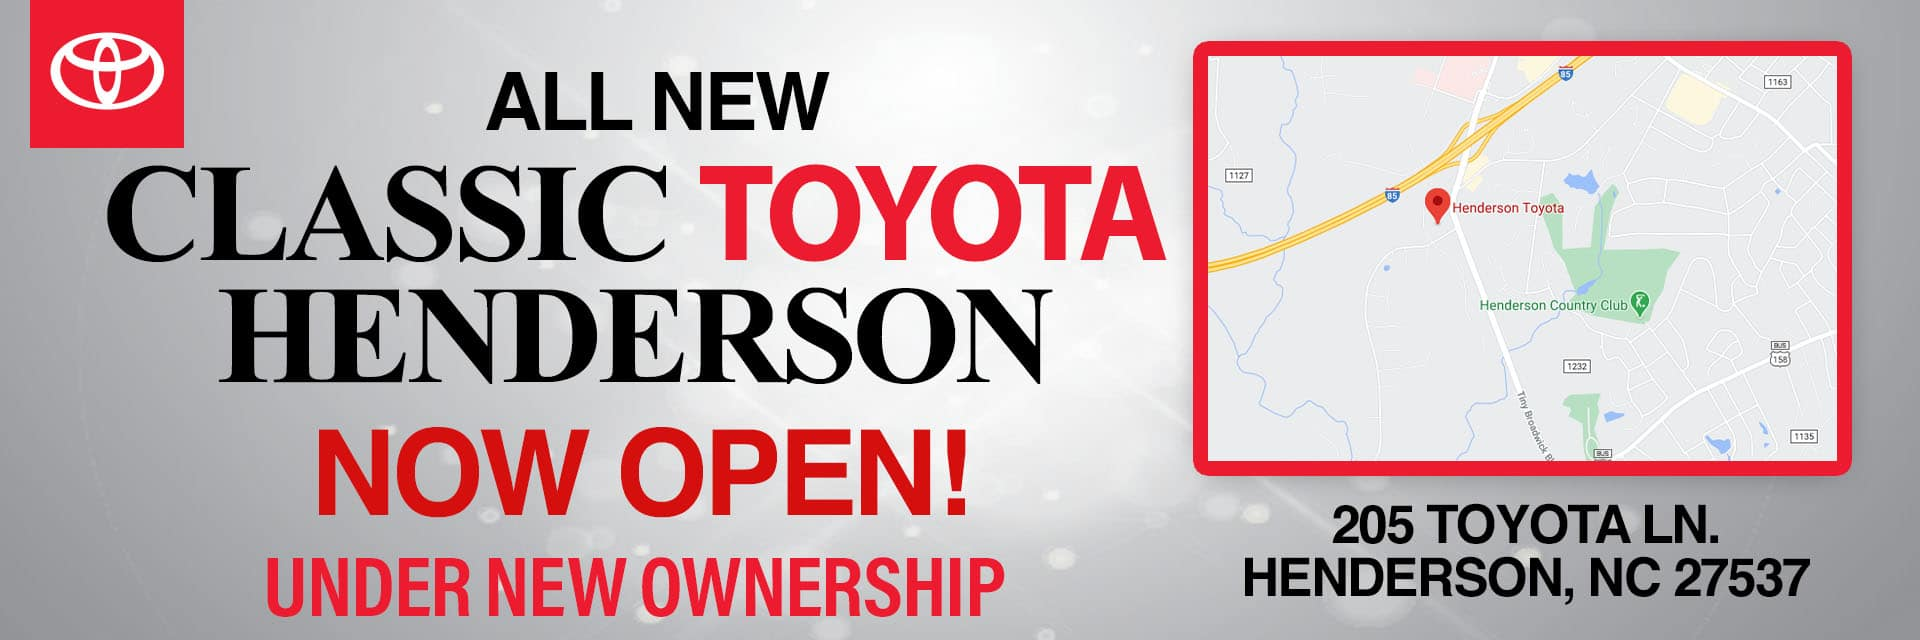 Now Open SliderClassic Toyota of Henderson Now Open u